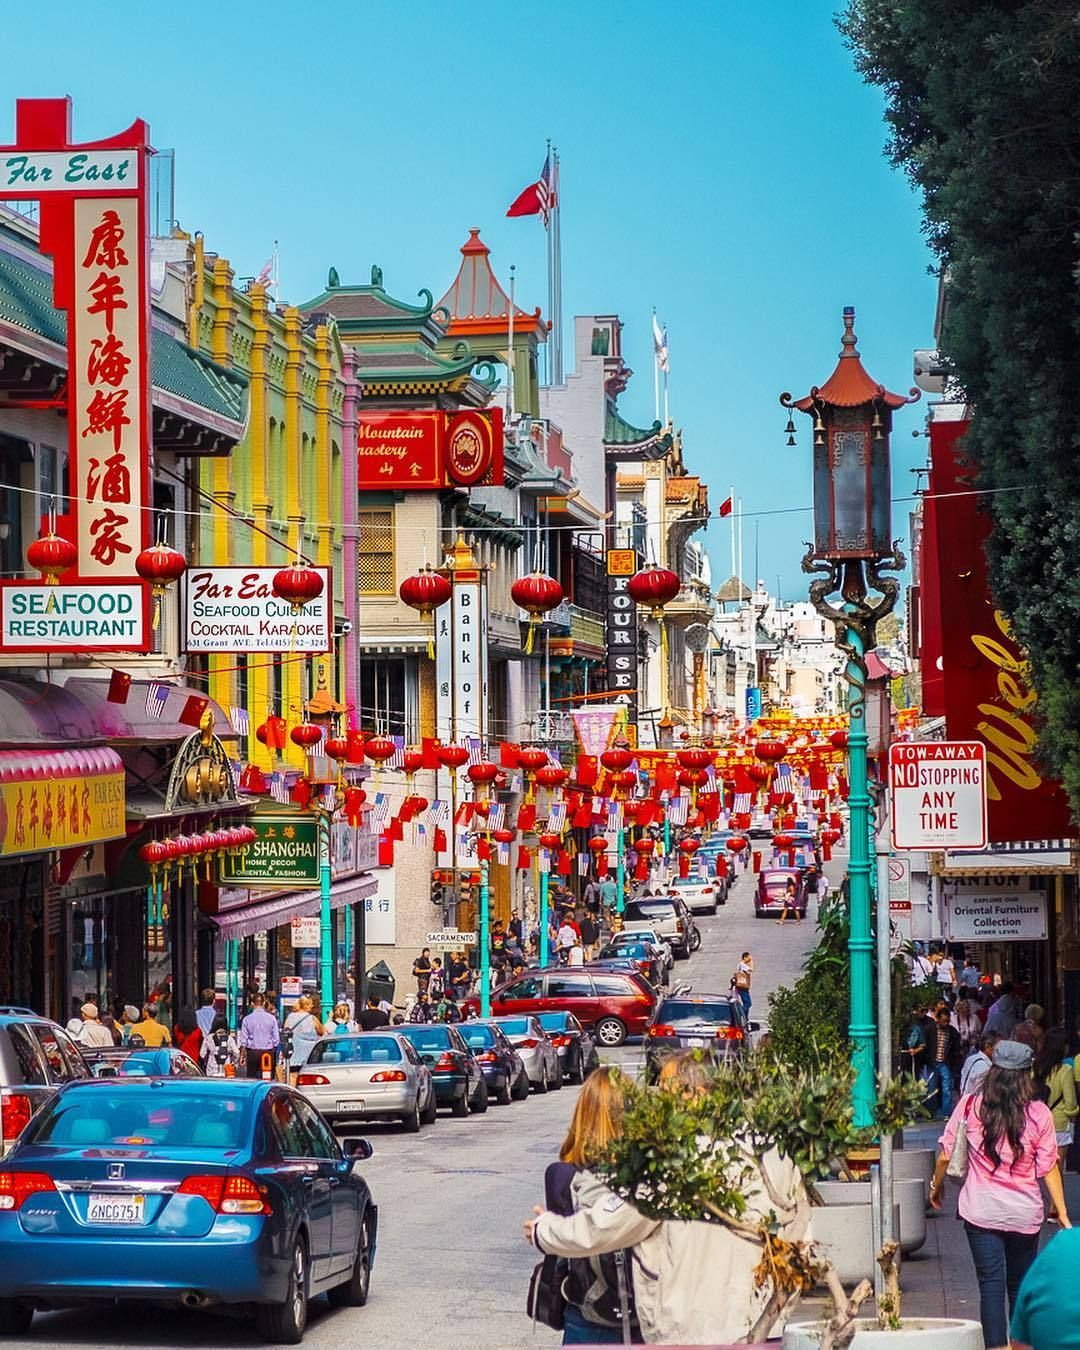 Chinatown San Francisco California by Krlis Dambrns